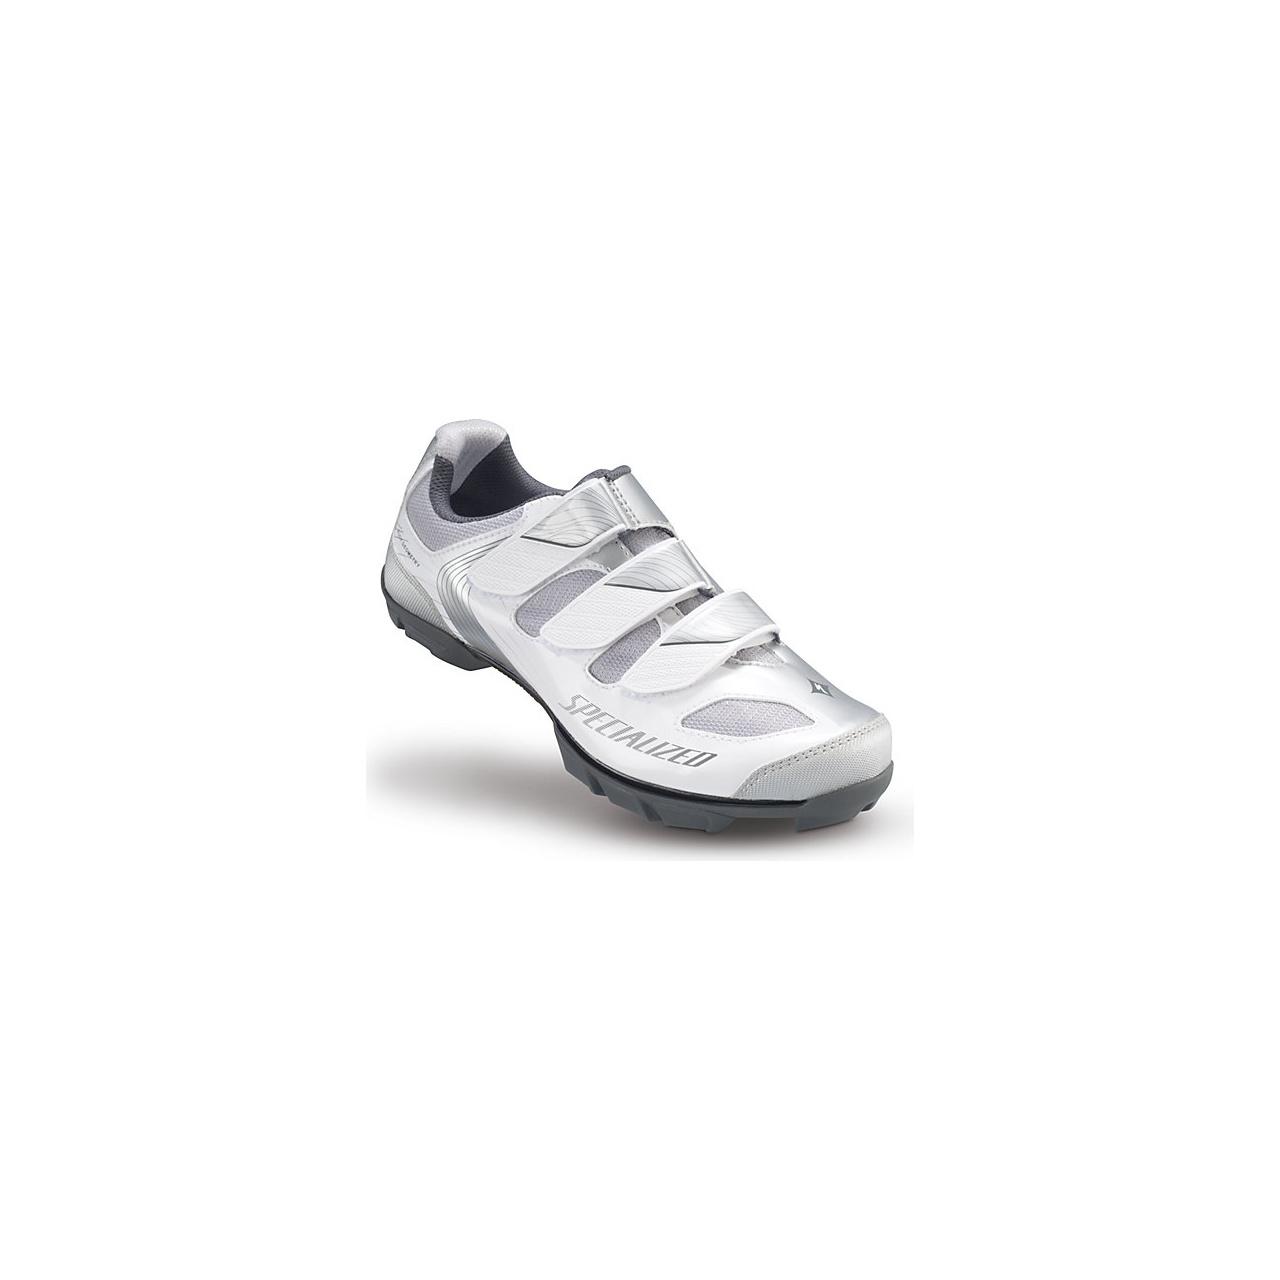 oblečení boty cyklo - specialized riata mtb w 2015  0171ab94fc